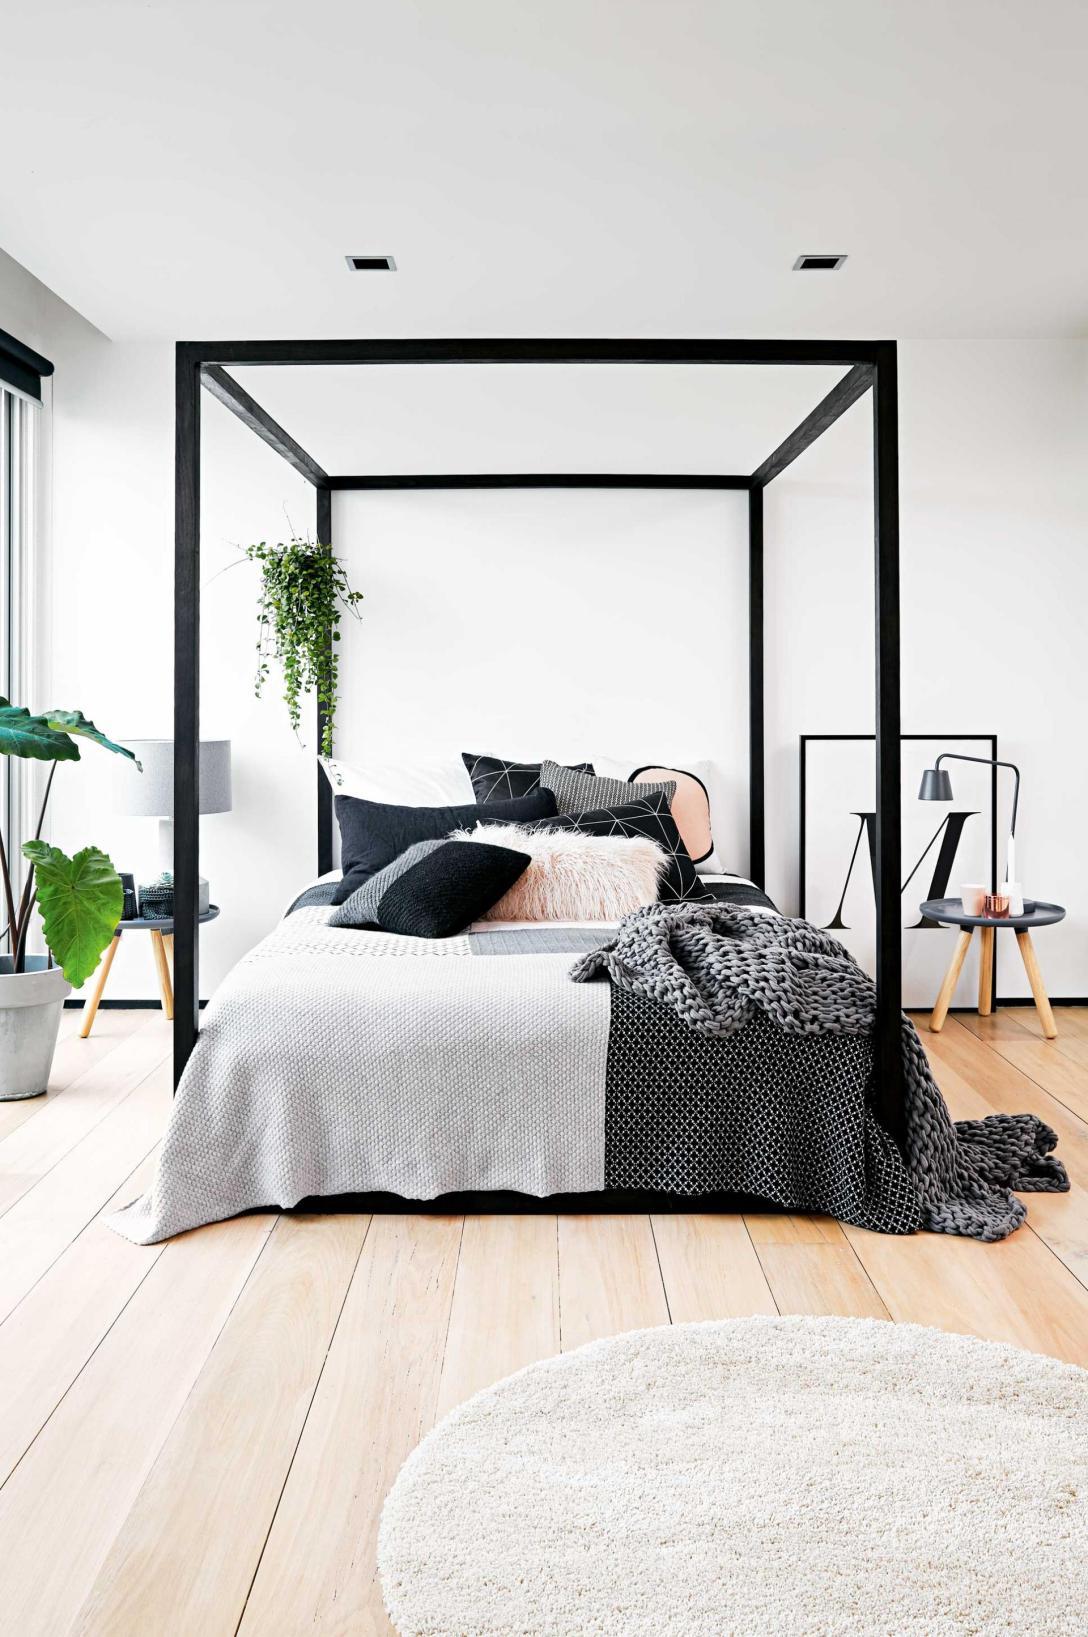 bedroom-modern-white-black-grey-sept15-20150914153446~q75,dx1920y-u1r1g0,c--